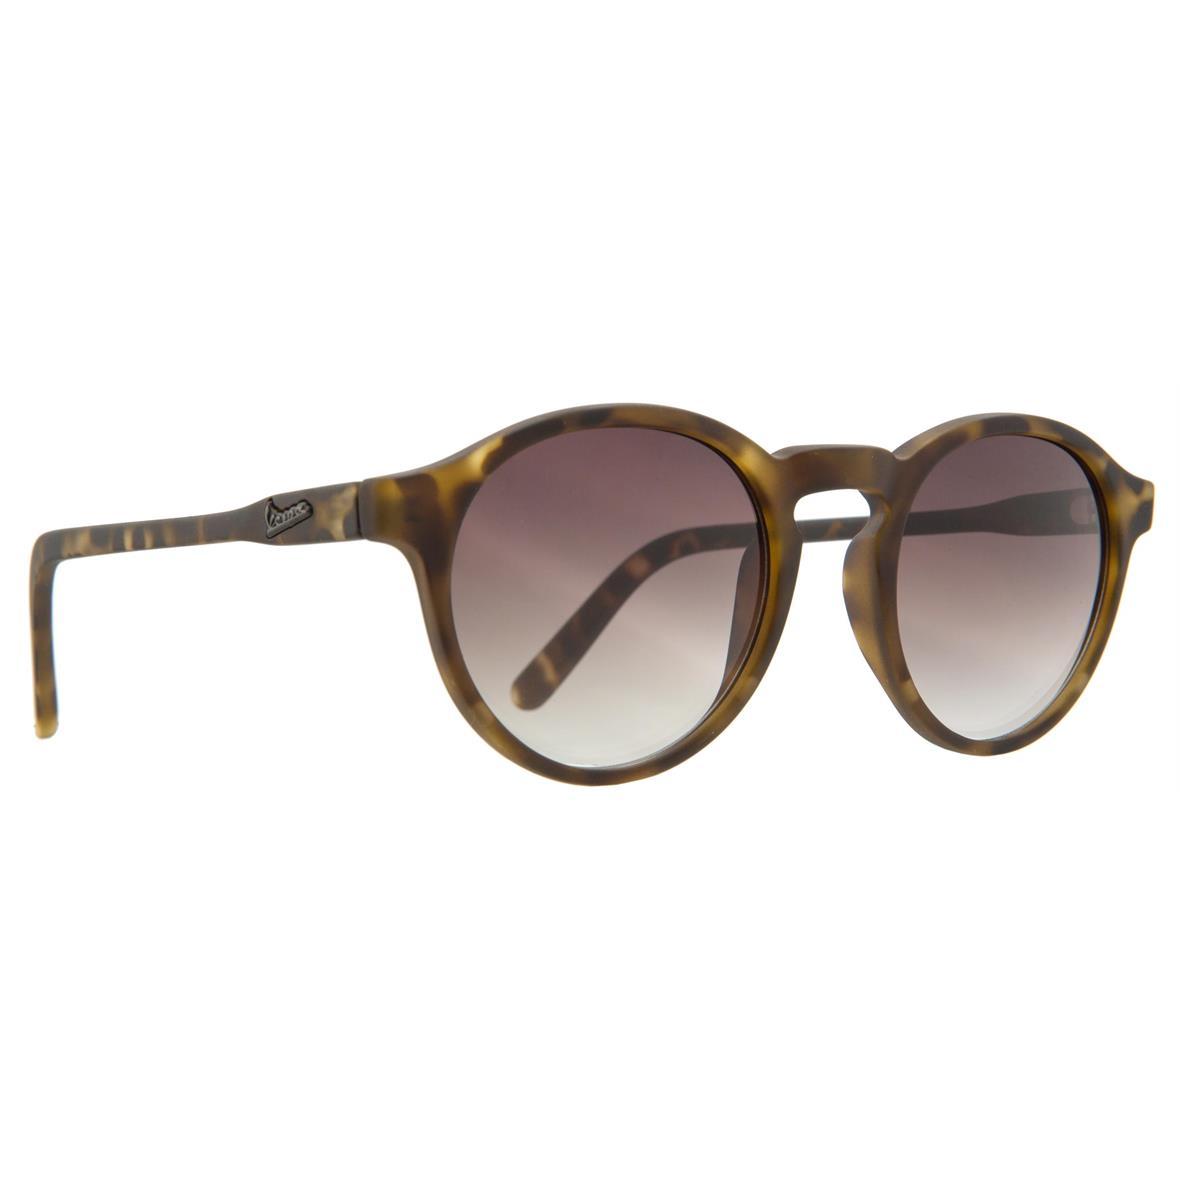 "Product Image for 'Sunglasses PIAGGIO Vespa ""Pantos""Title'"